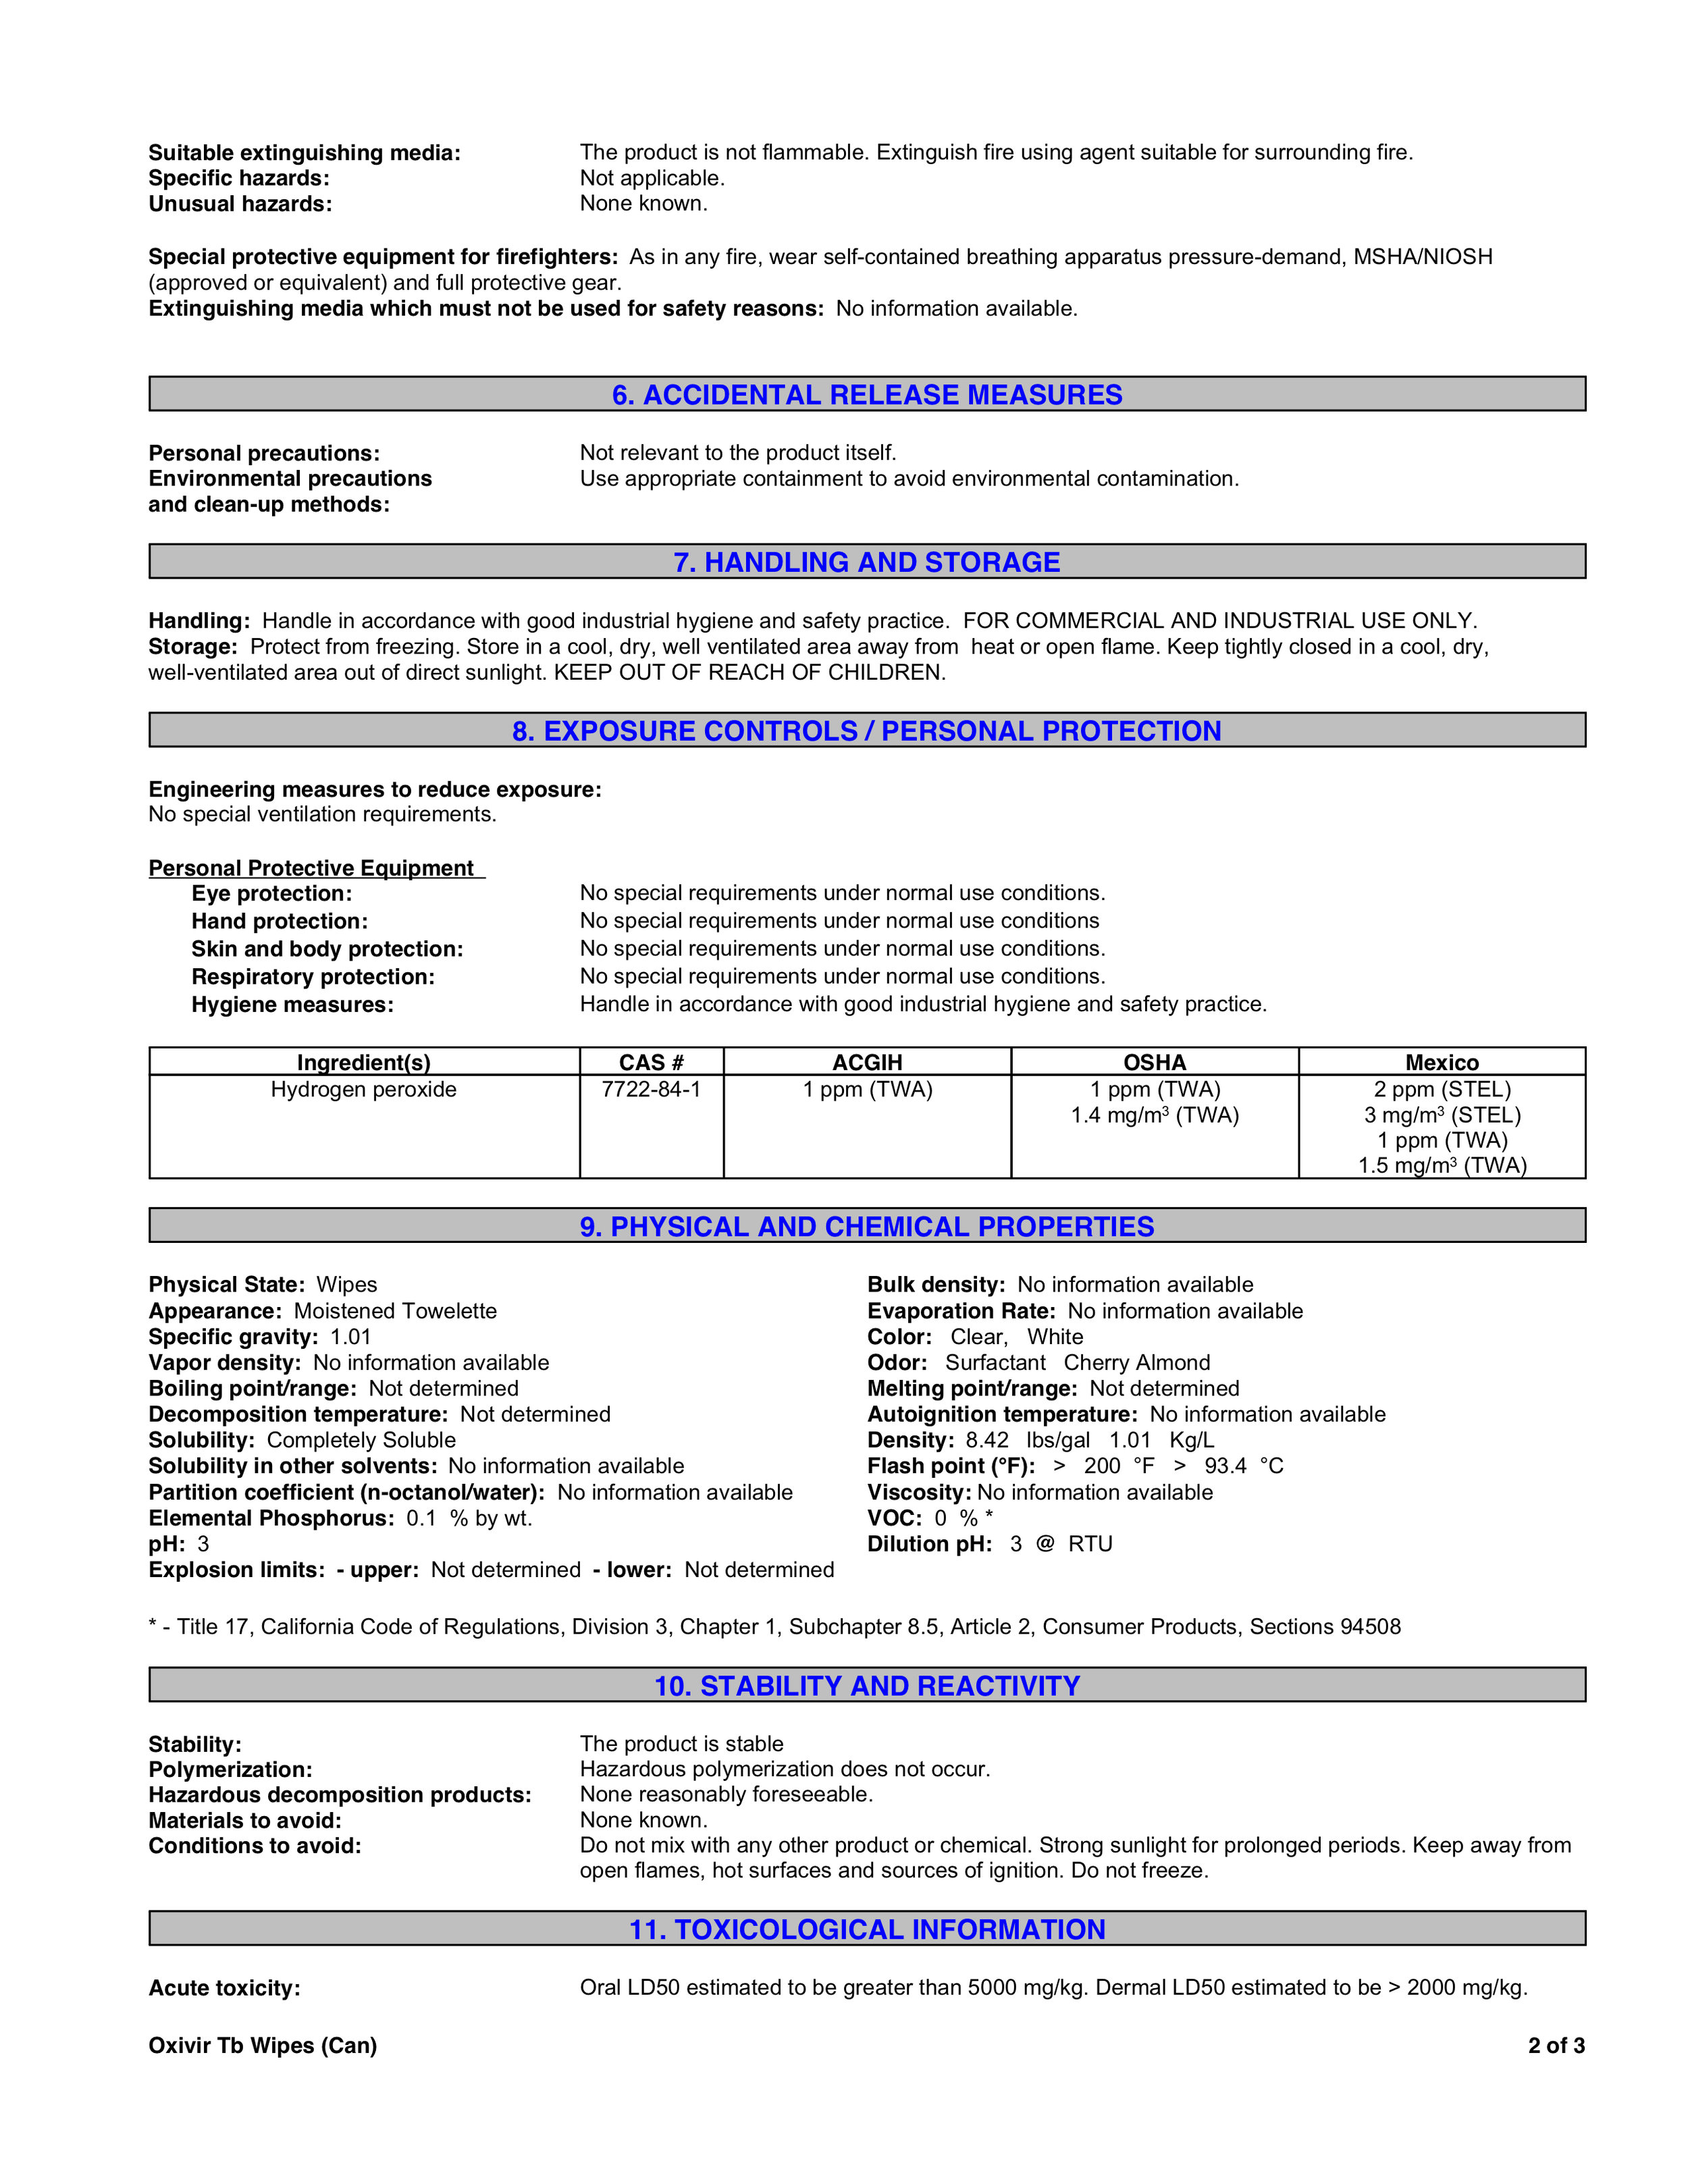 Oxivir TB MSDS Diversity-2.jpg